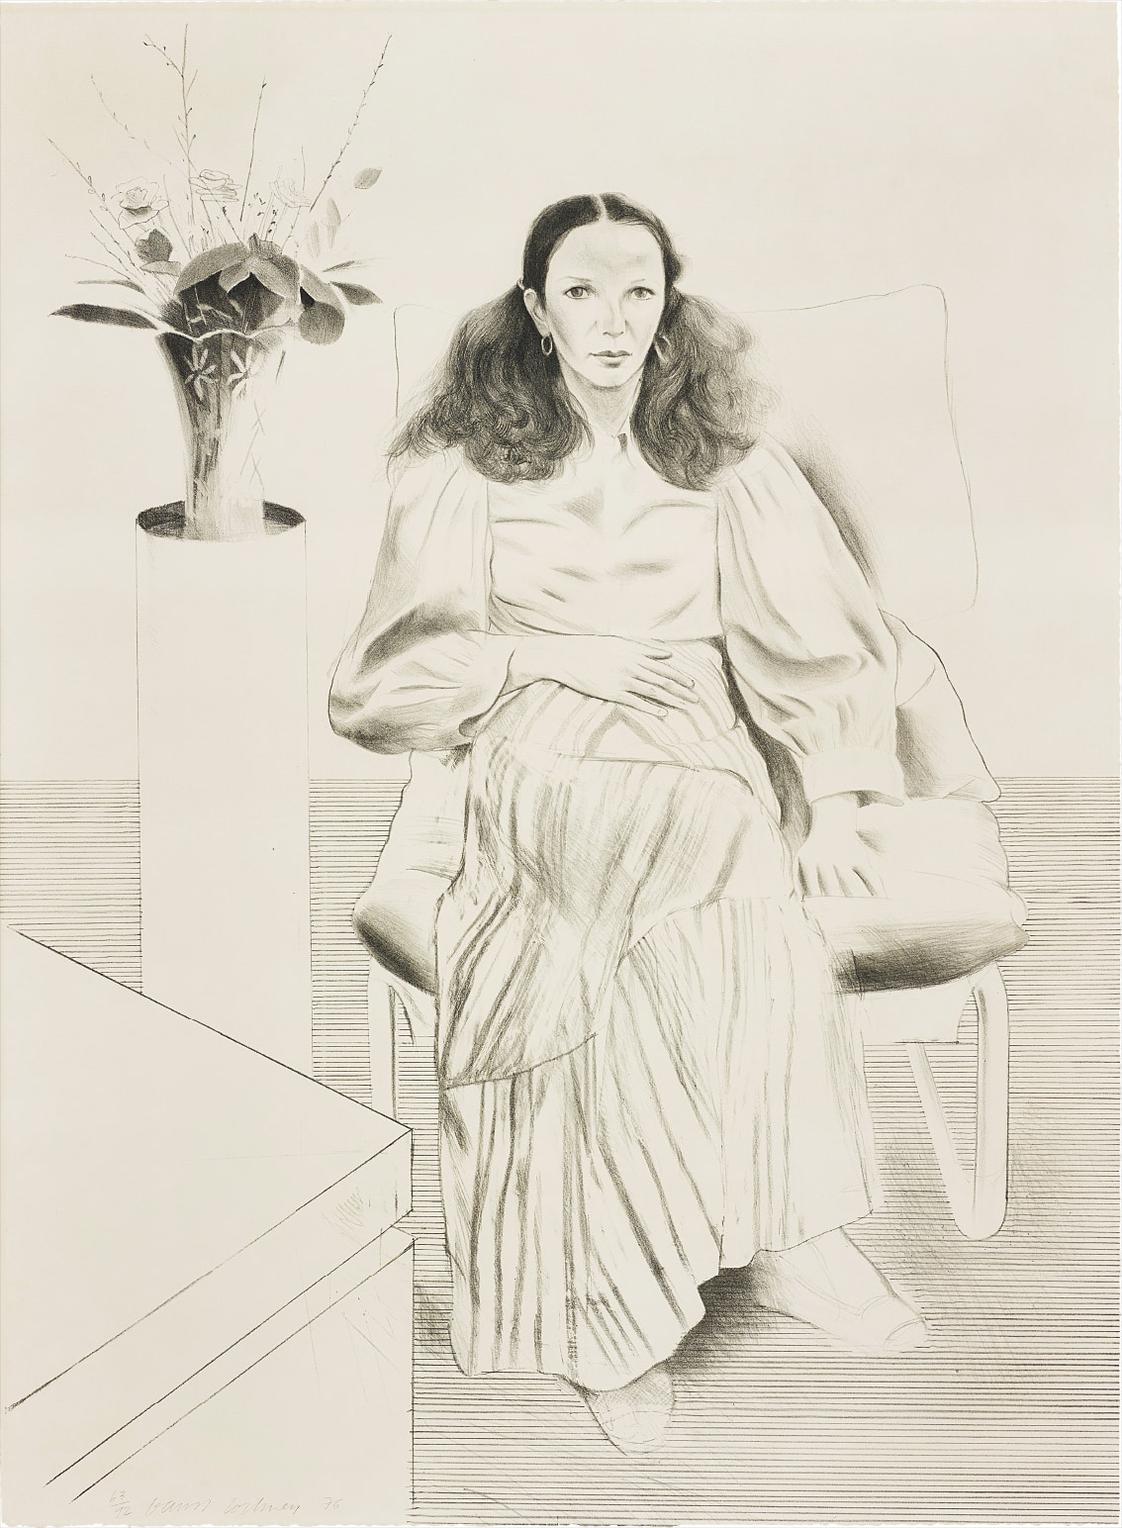 David Hockney-Brooke Hopper, From Friends-1976